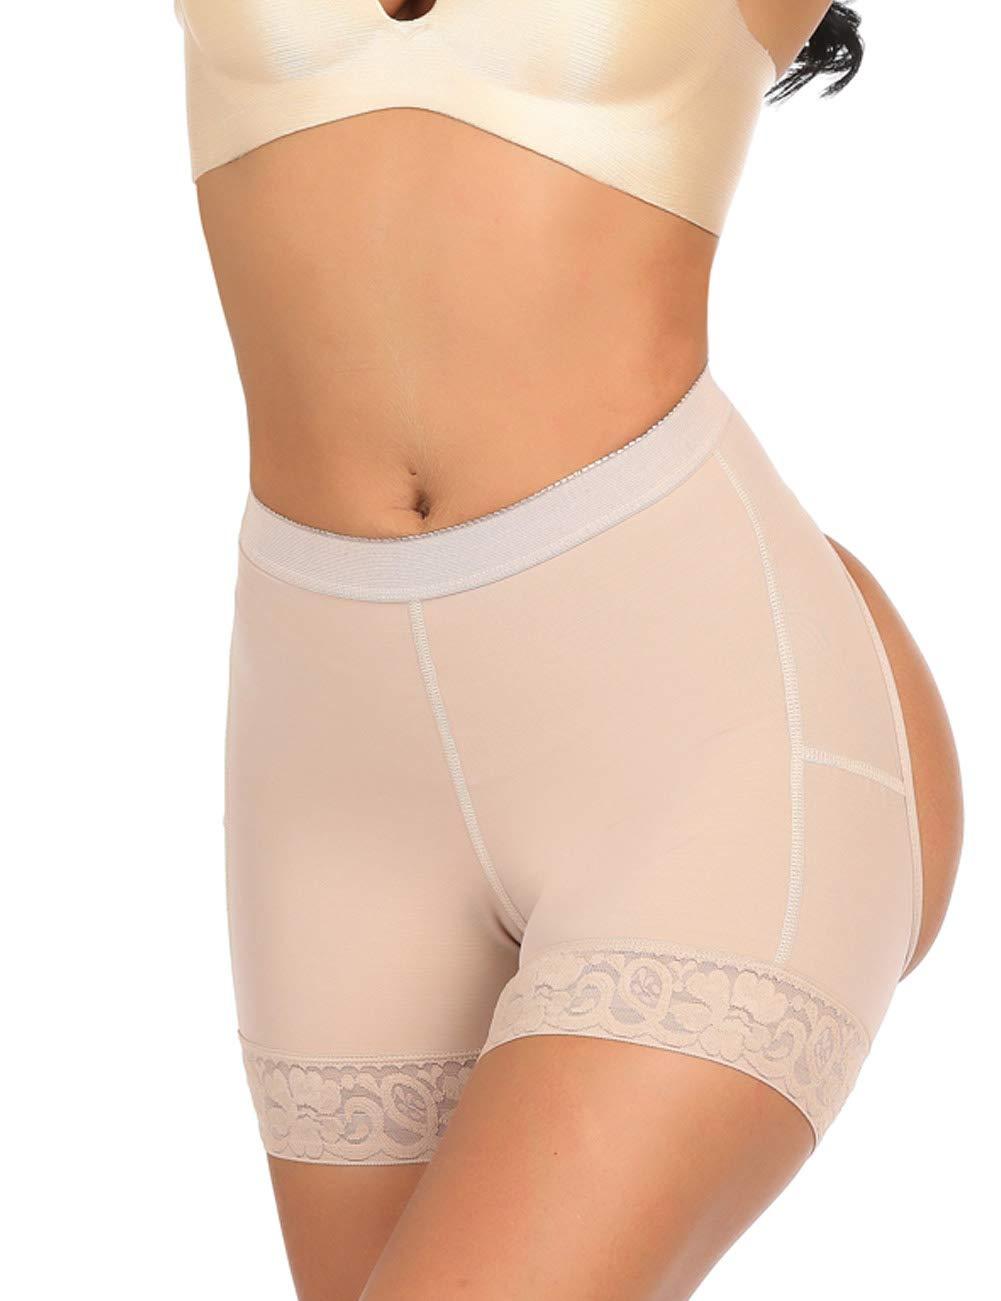 Sweetlover Women Shapewear Butt Lifter Body Shaper Tummy Control Panties Enhancer Underwear Girdle Booty Lace Shorts Seamless